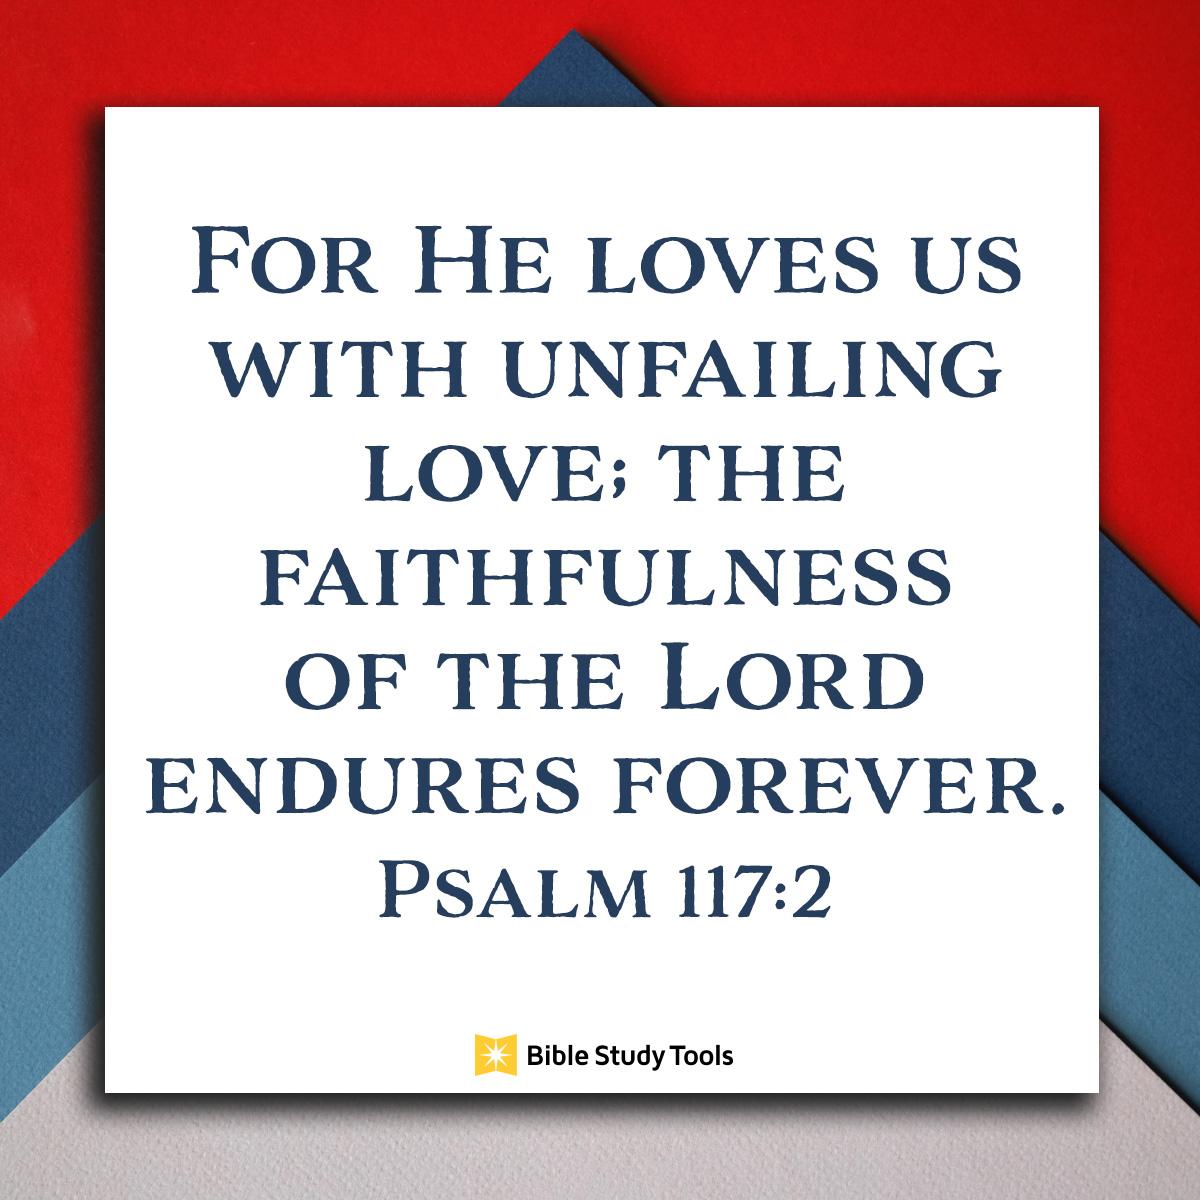 Psalm 117:2, inspirational image